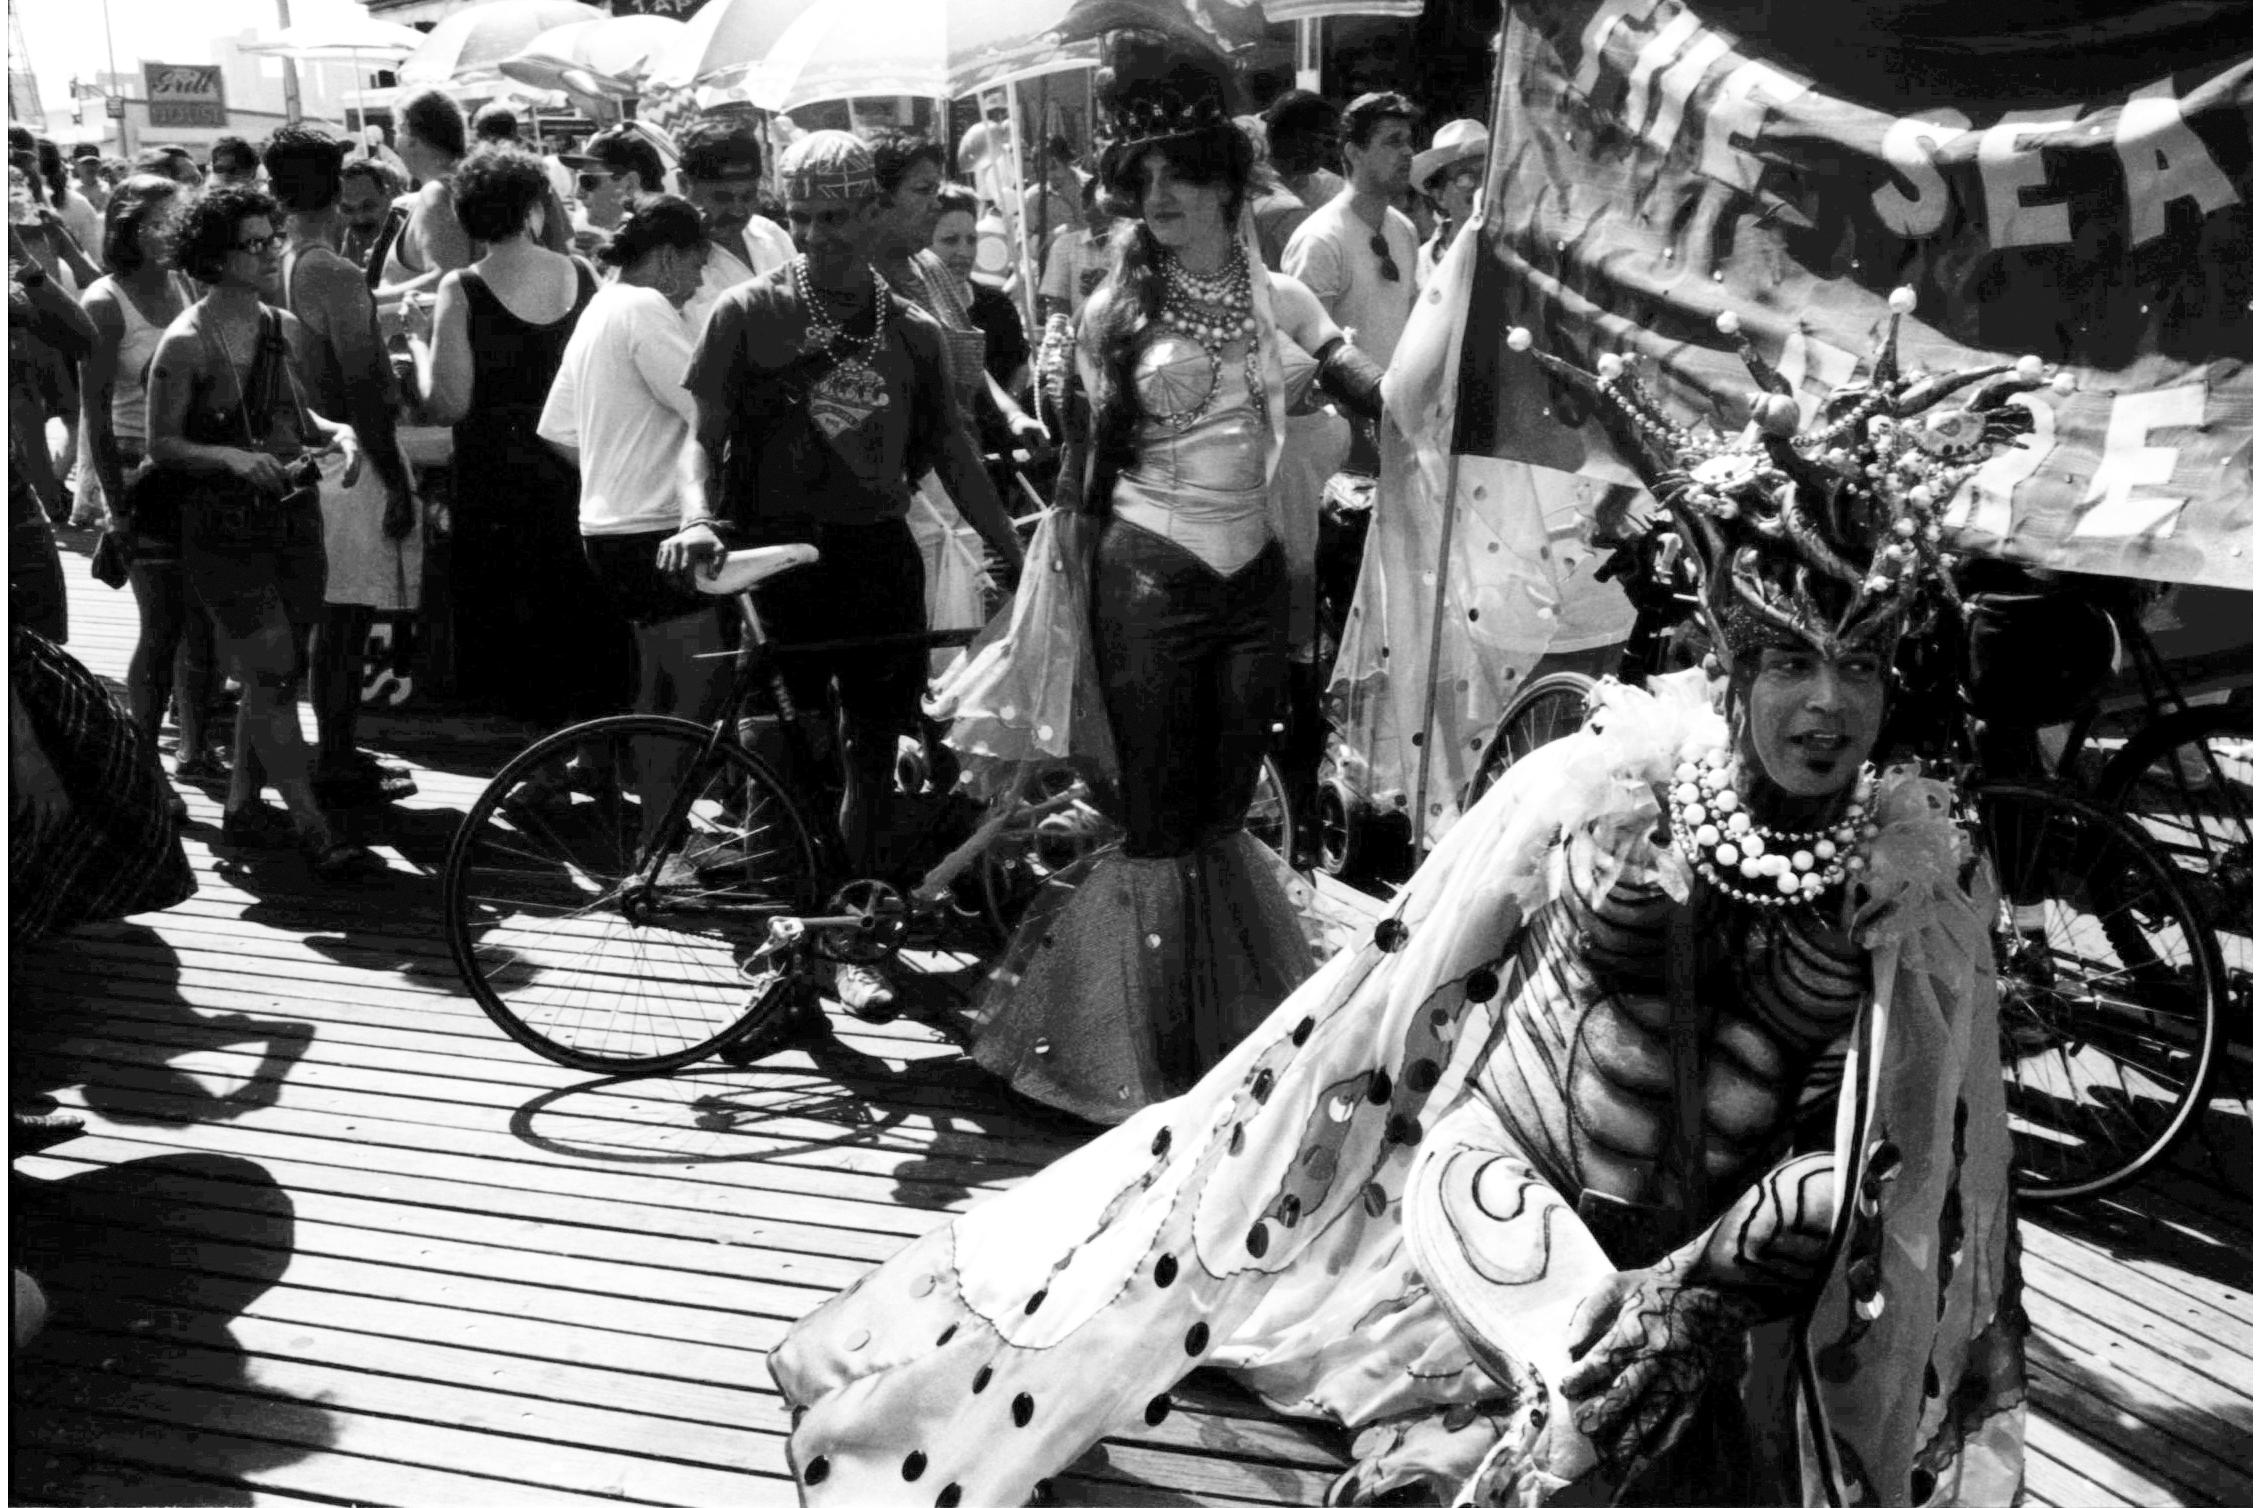 Mermaid Parade, 1993